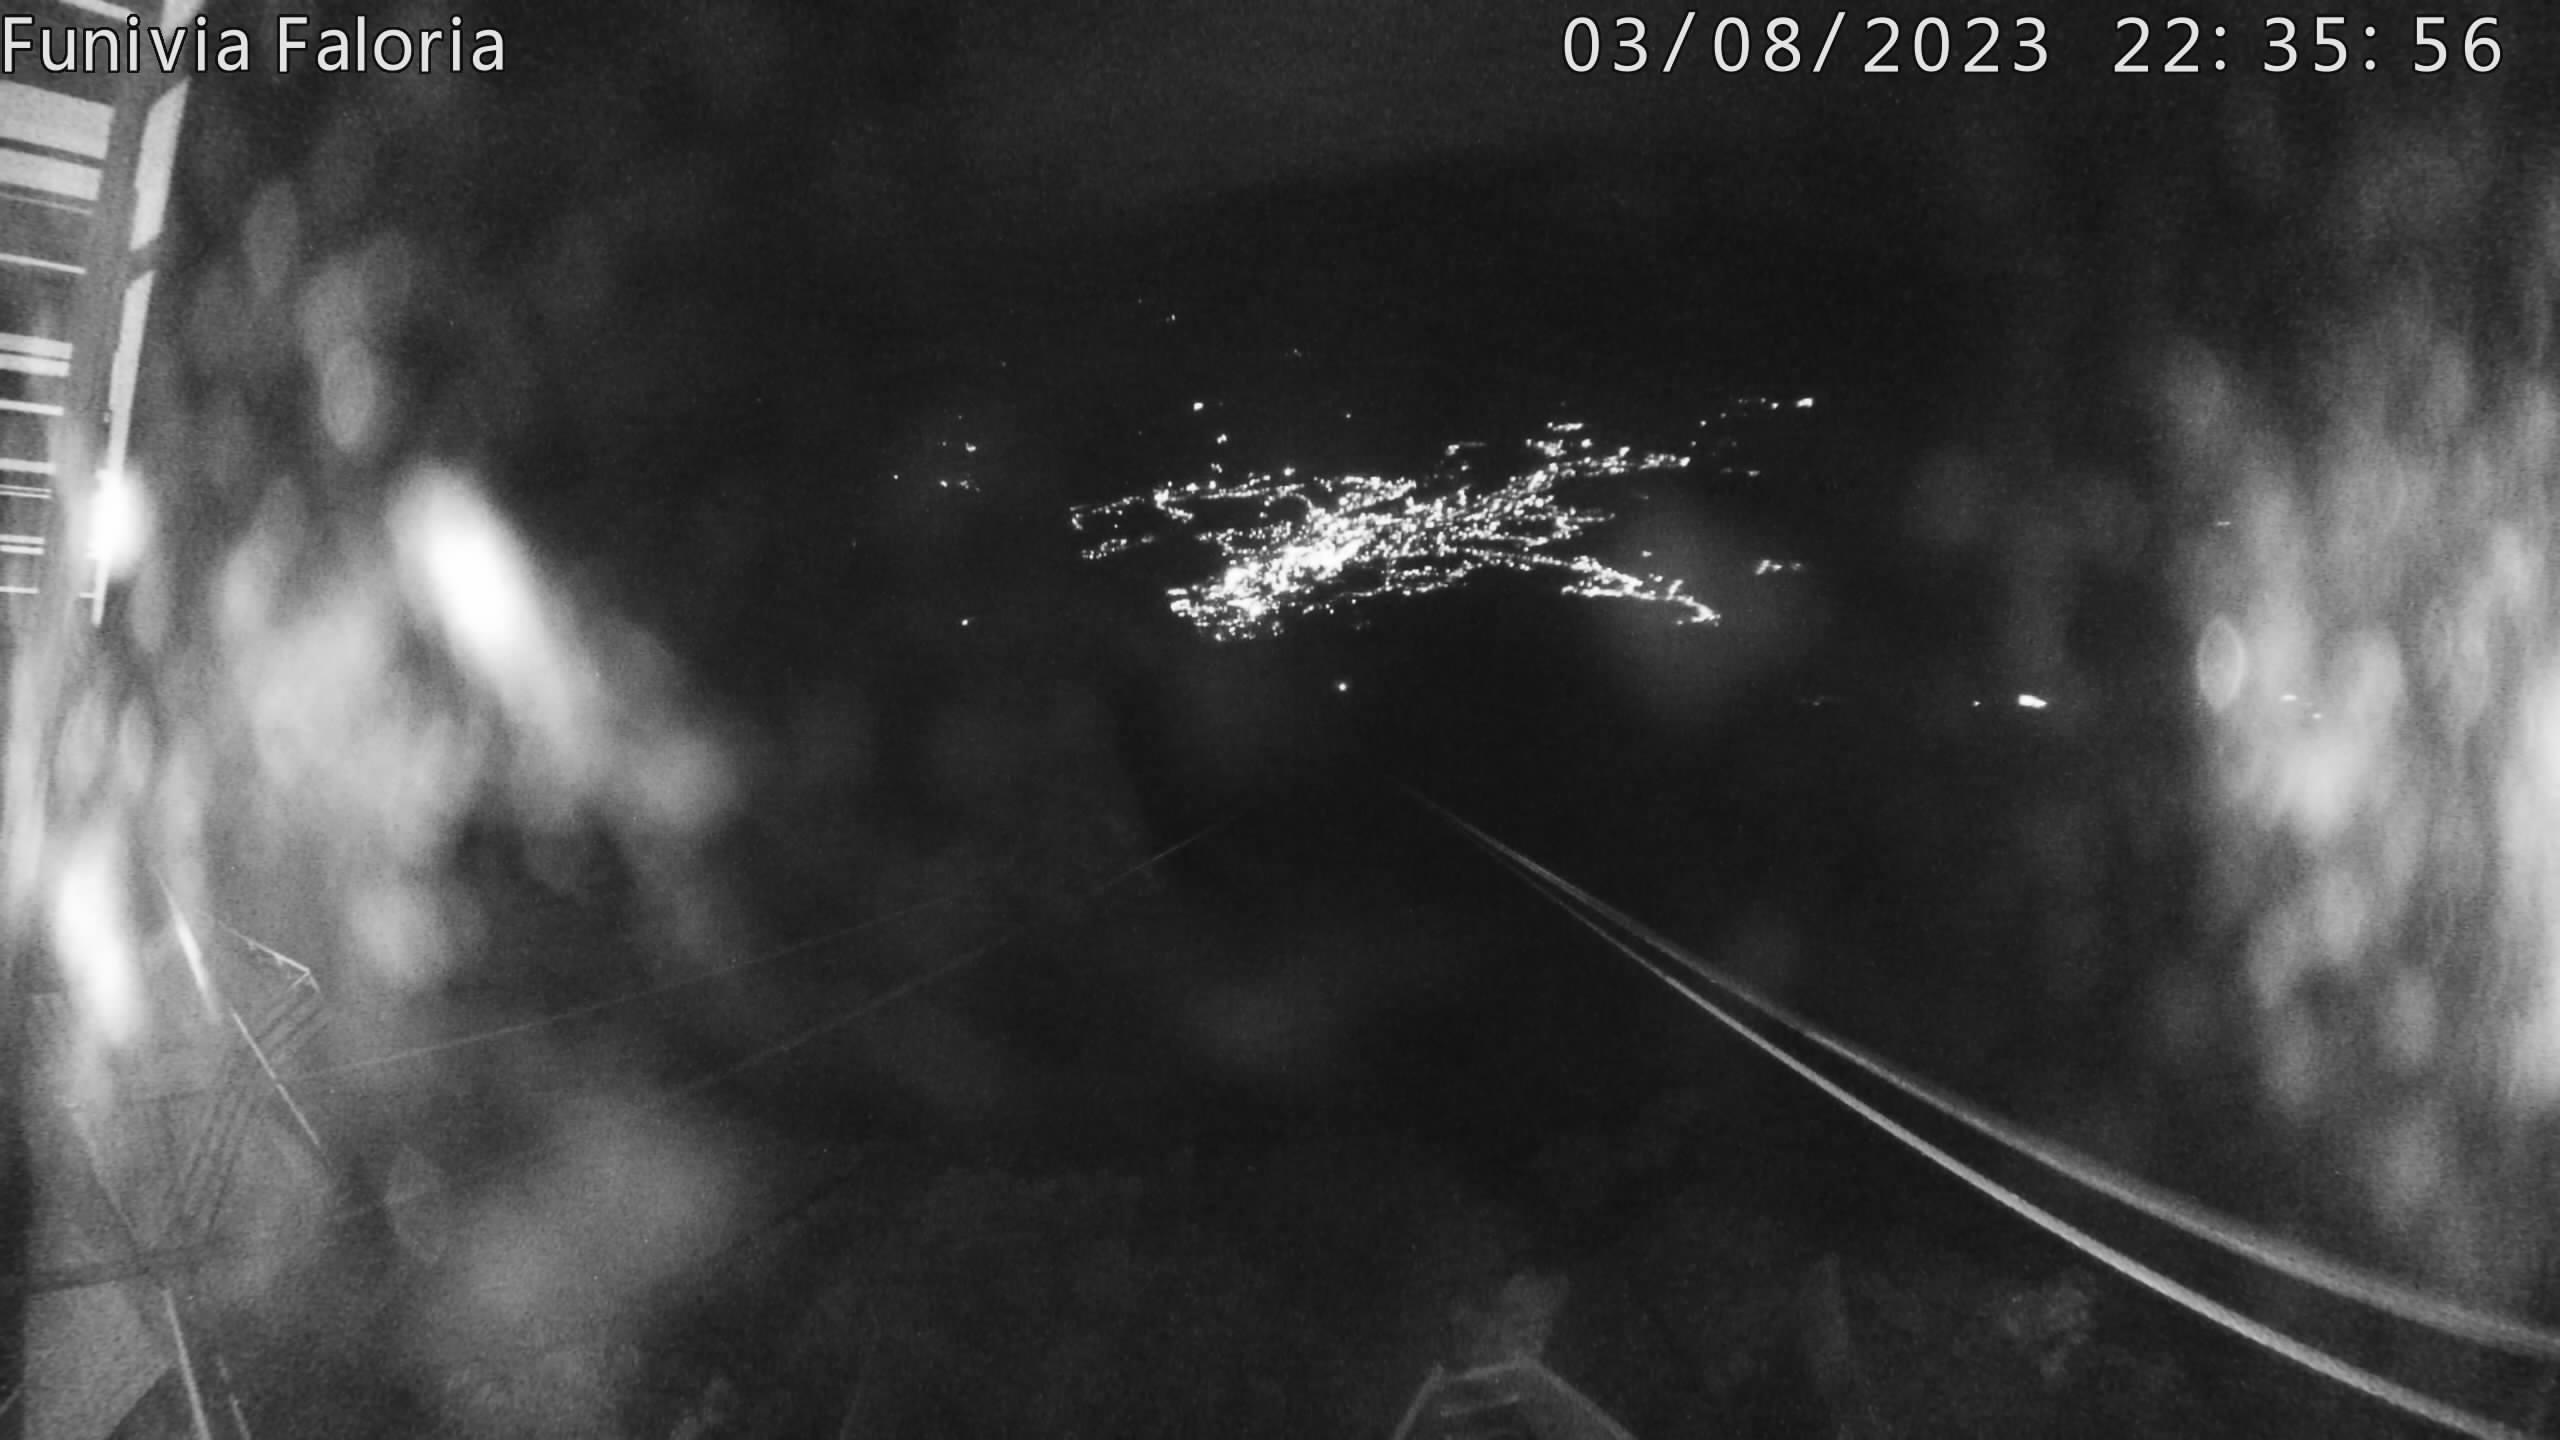 Dalla funivia Faloria, Panorama di Cortina